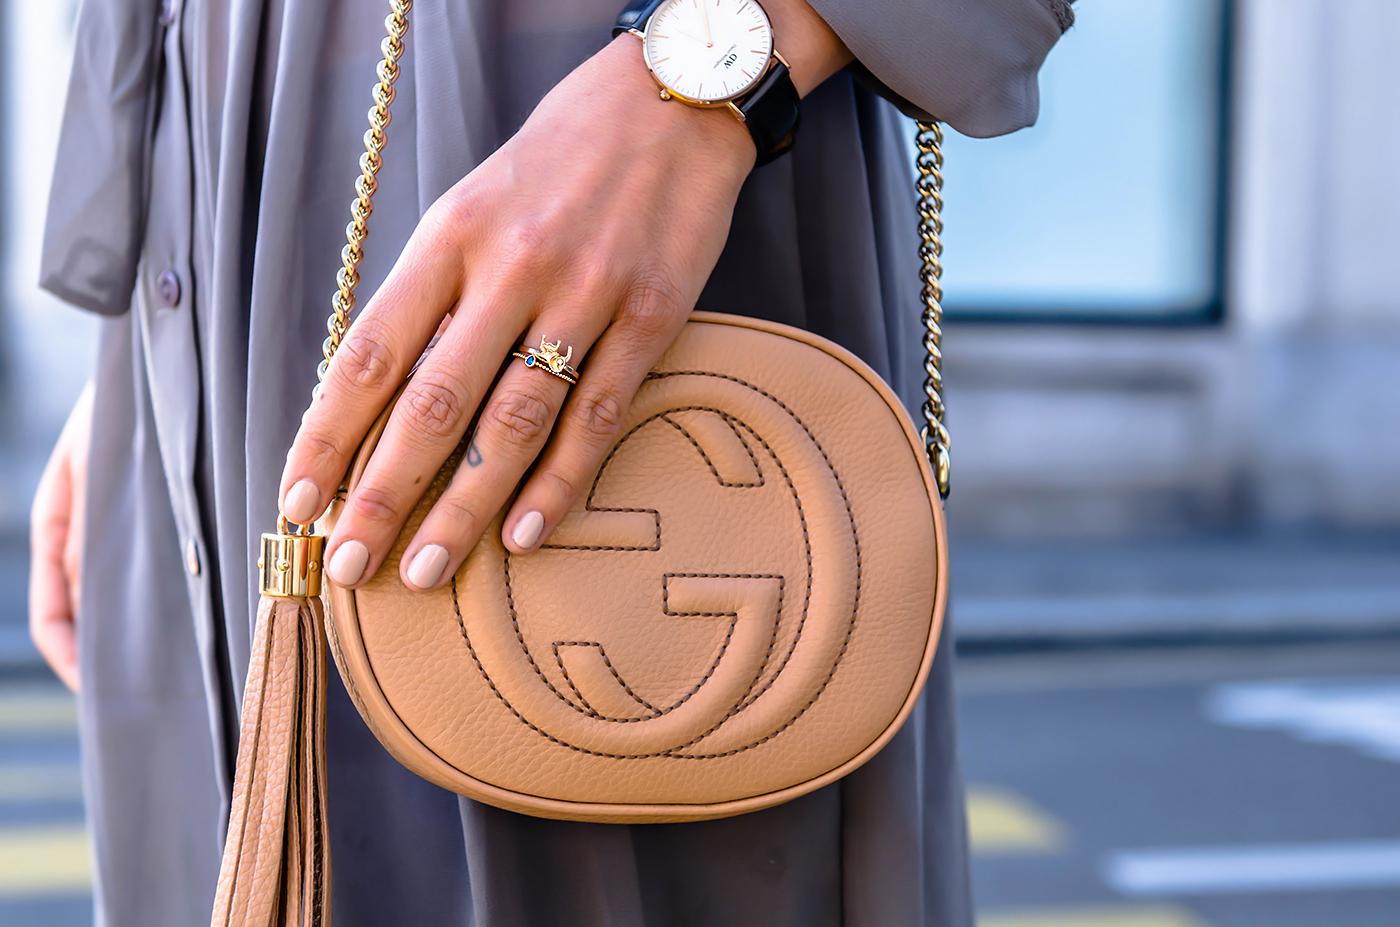 alison liaudat, blog mode suisse, swiss fashion blogger, Fashion blog from Switzerland, vitstyle, gucci soho leather, karen walker eyewear, daniel wellington, animas code, Astrid and miyu, FIVE Jeans, shopbop,